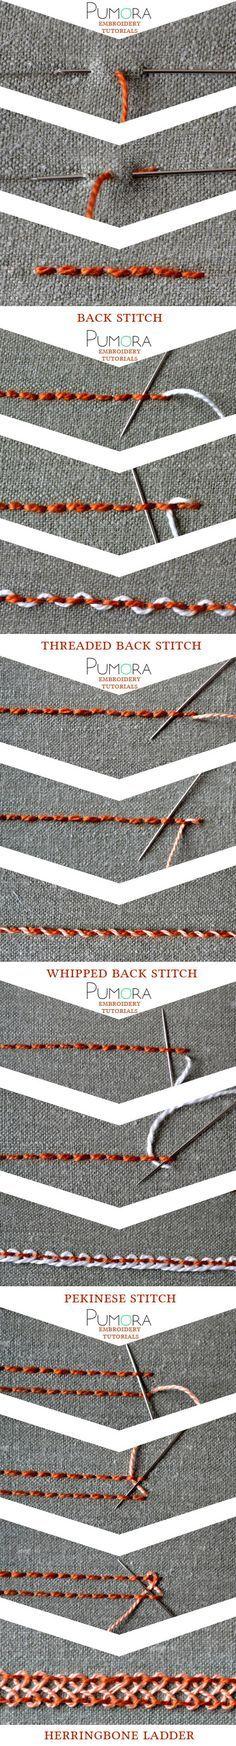 embroidery tutorials: backstitch with variations bordado, ricamo, broderie, sticken